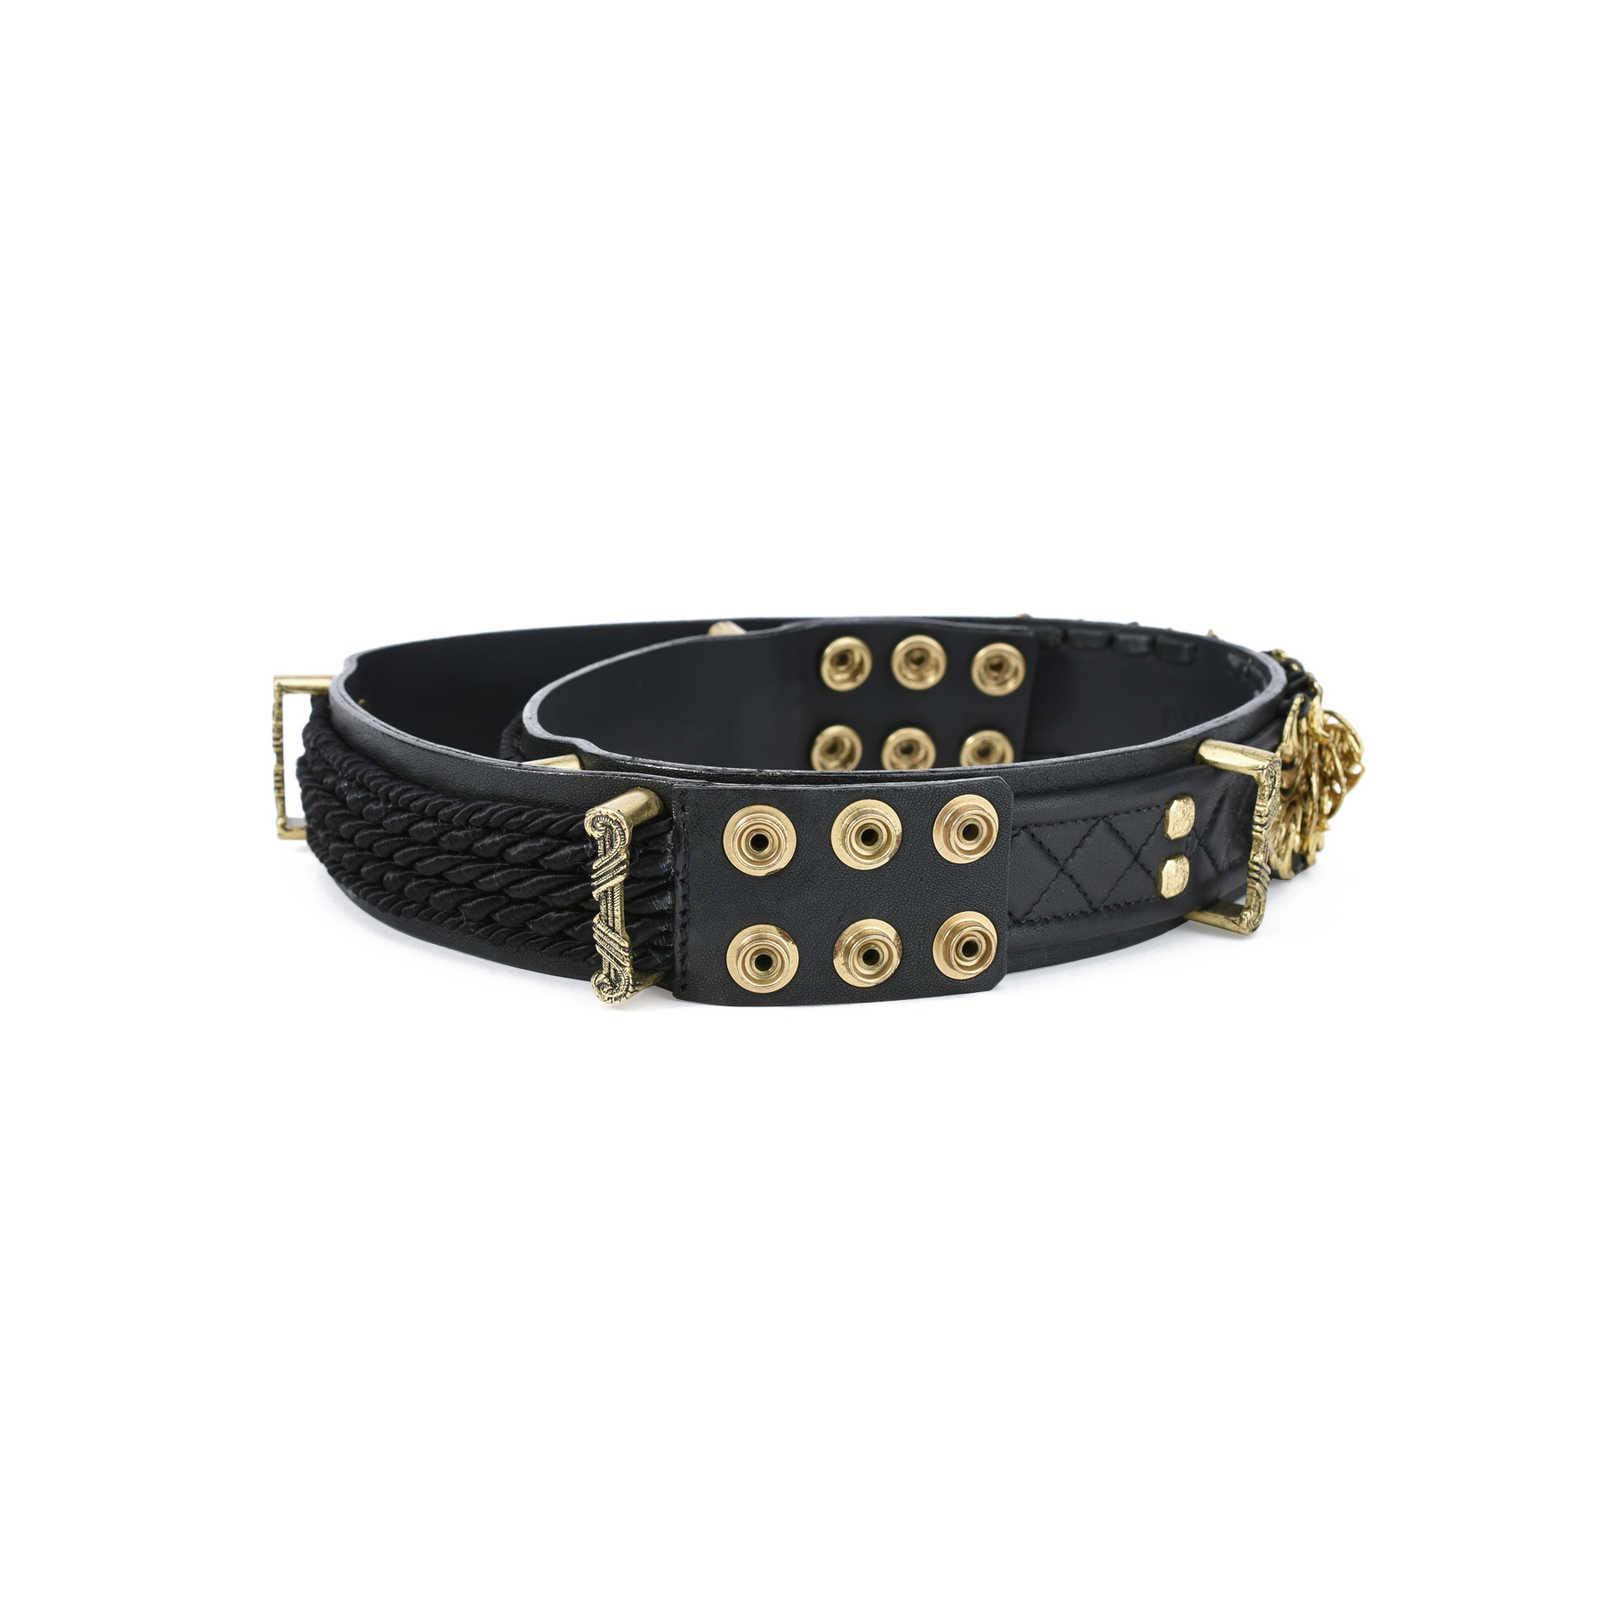 Gold-tone Leather Belt - FR40 Balmain HkJnM